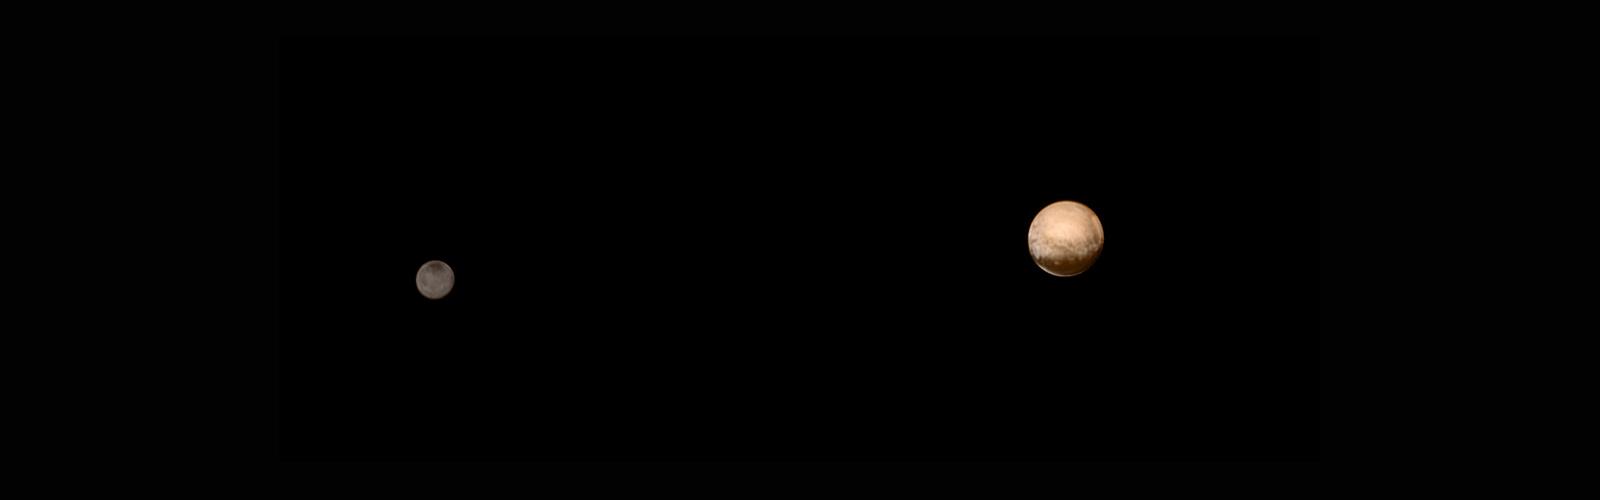 Overview | Pluto Moons – Solar System Exploration: NASA ...